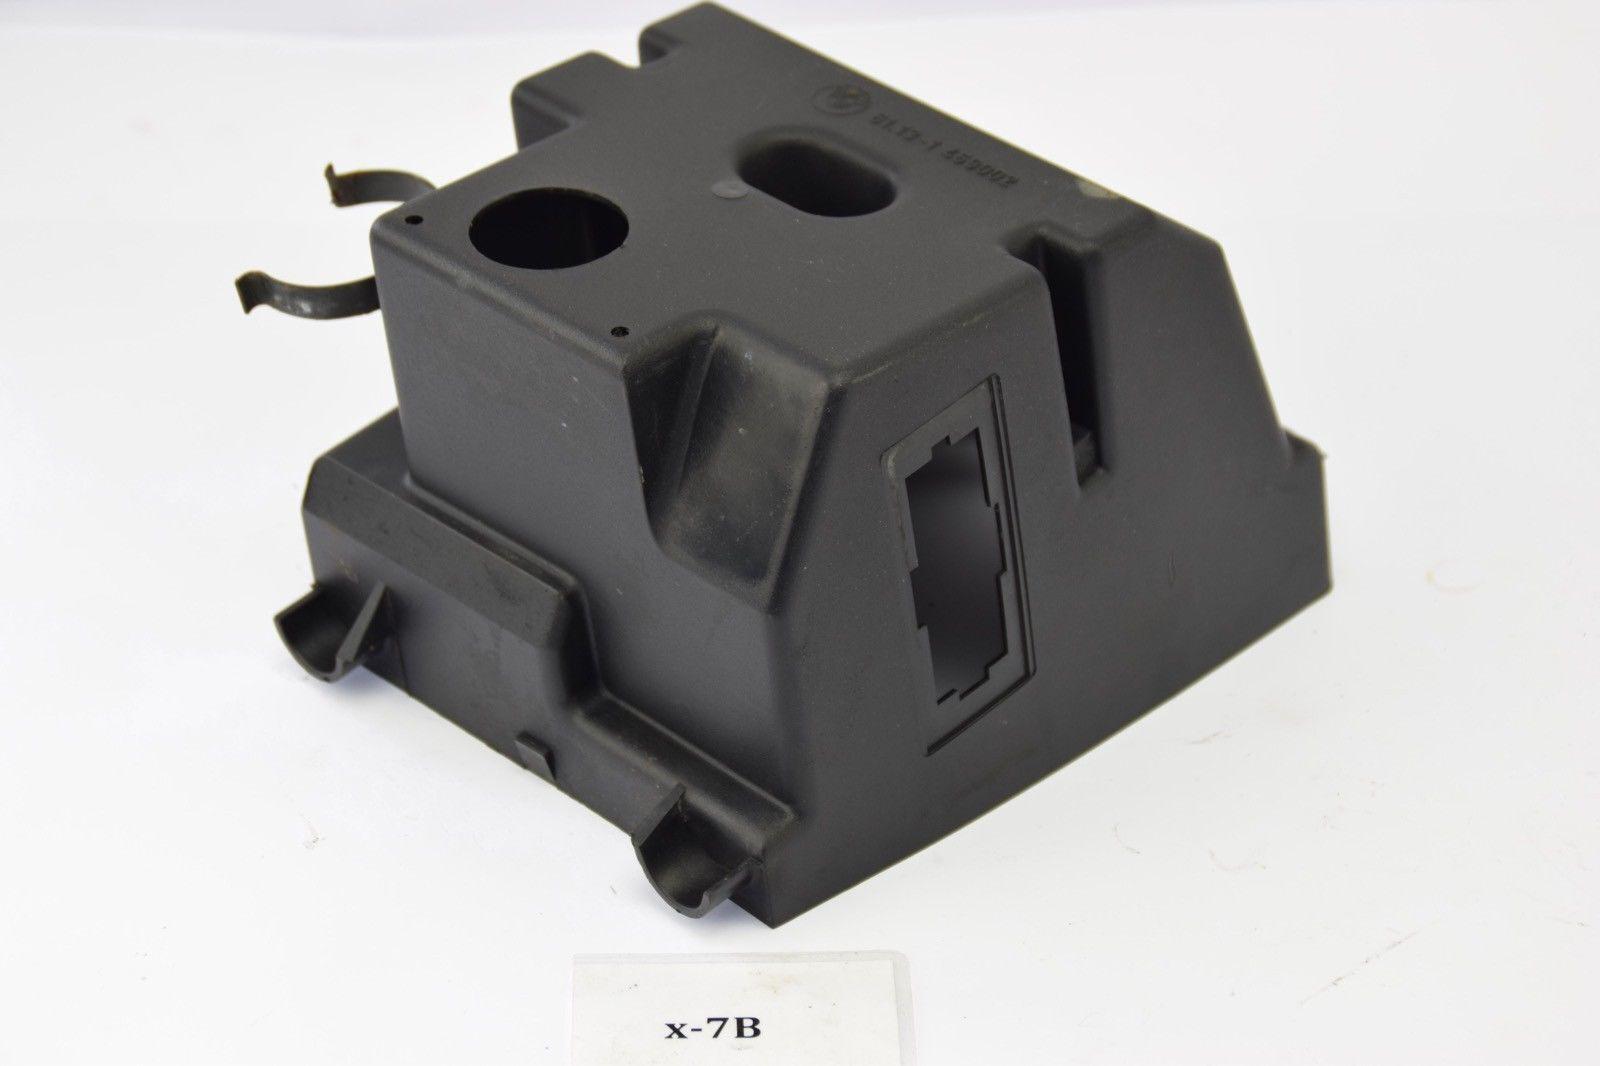 Bmw K 100 Lt Bj1988 Electronic Box Fuse Eur 1980 Picclick Ie K100 2 Of 4